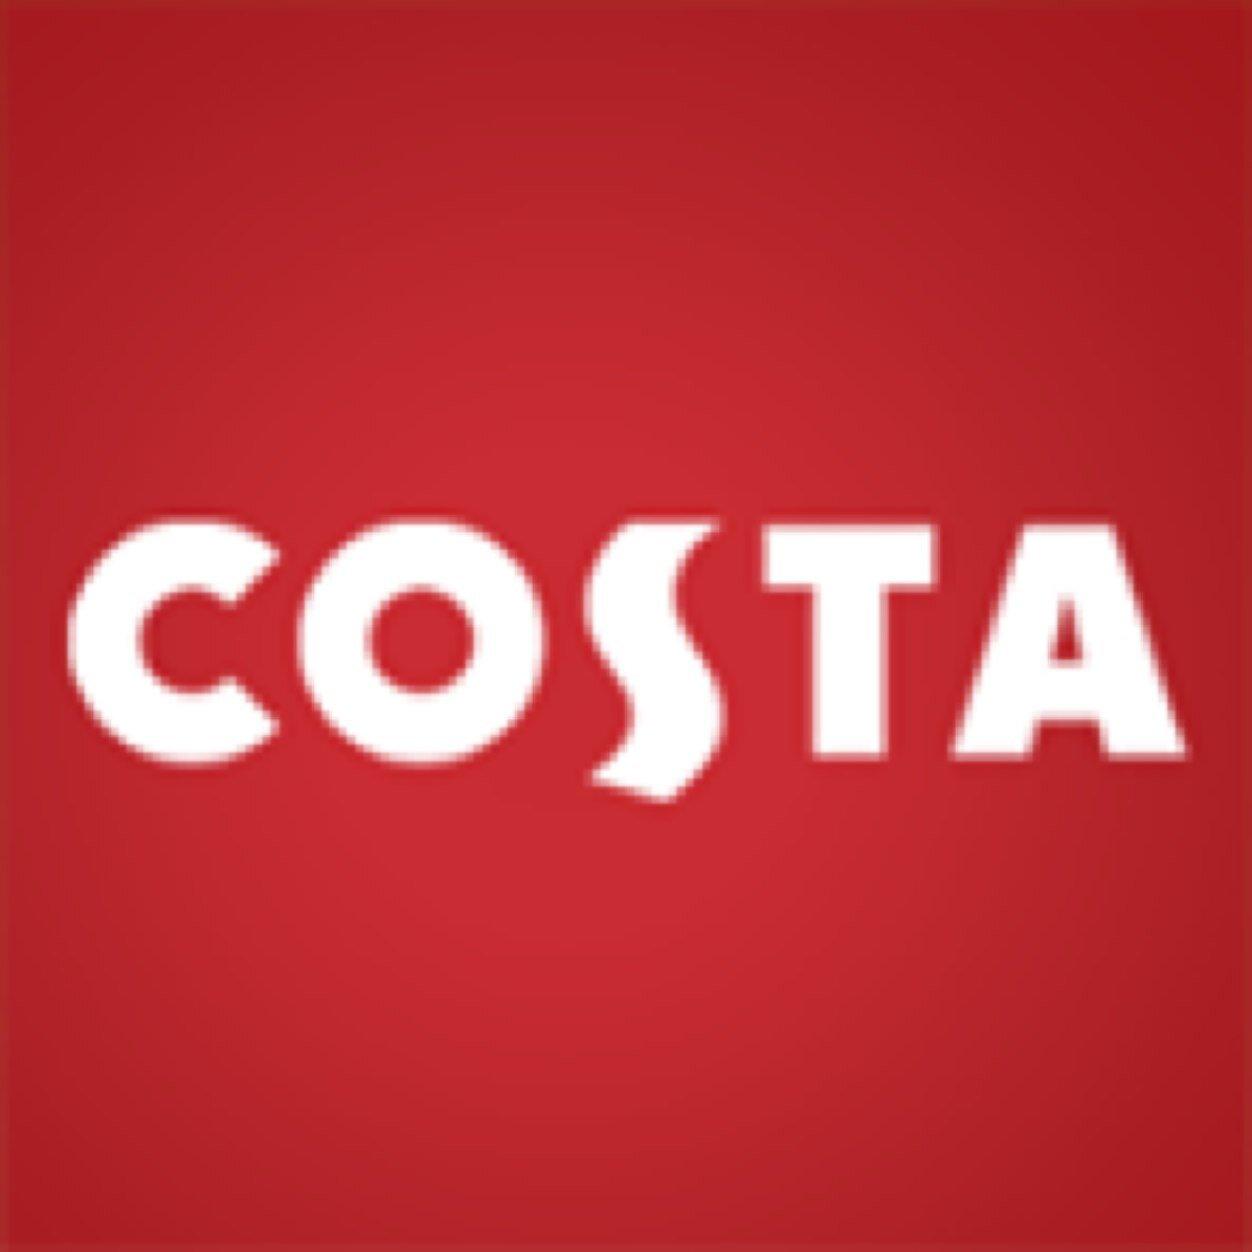 @CostaCoffee_ru